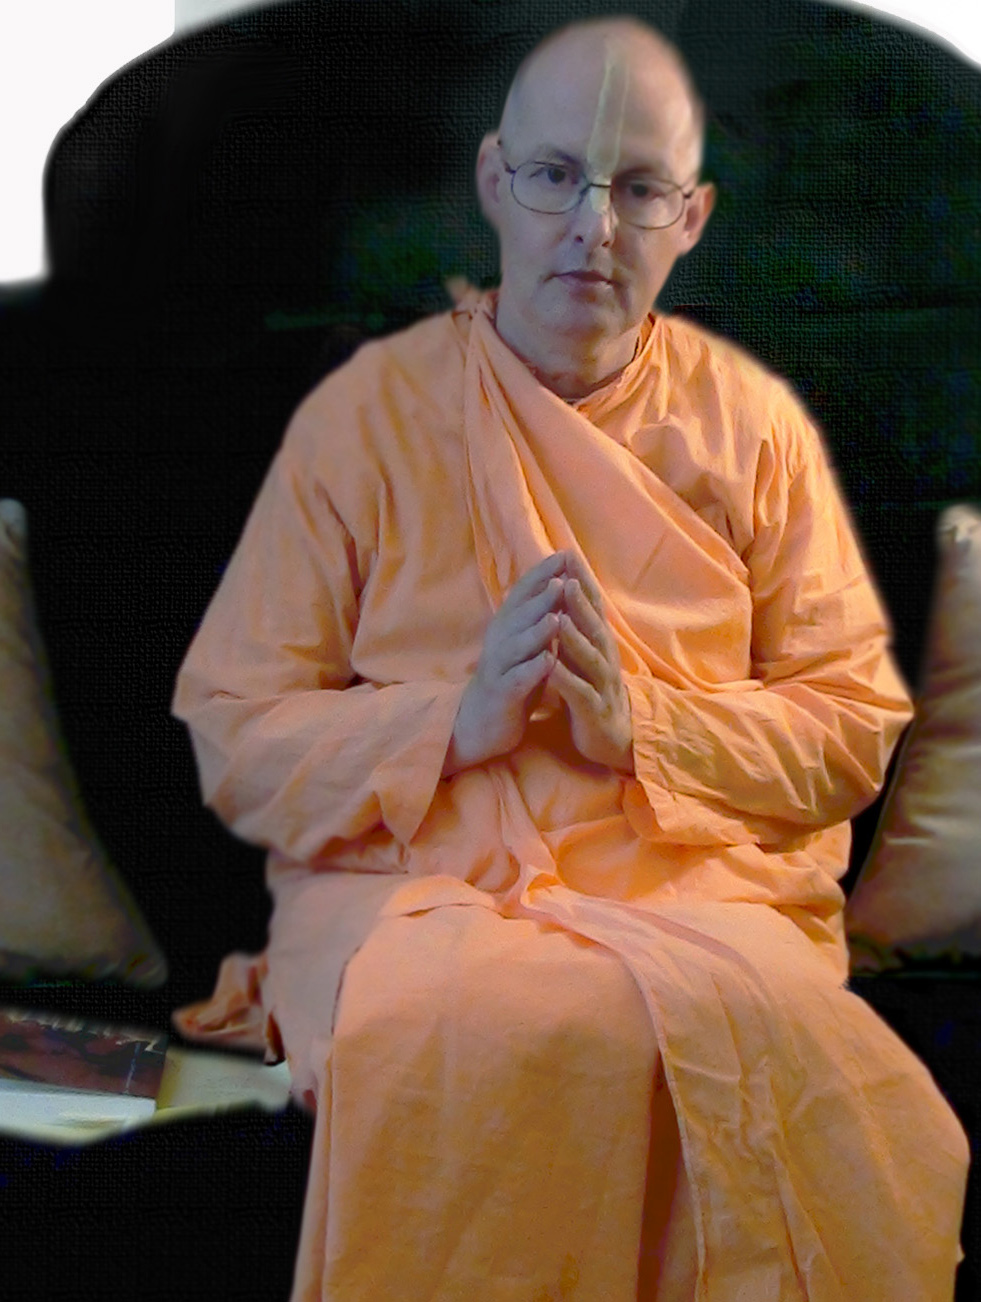 Satsvarupa dasa Goswami - Wikipedia